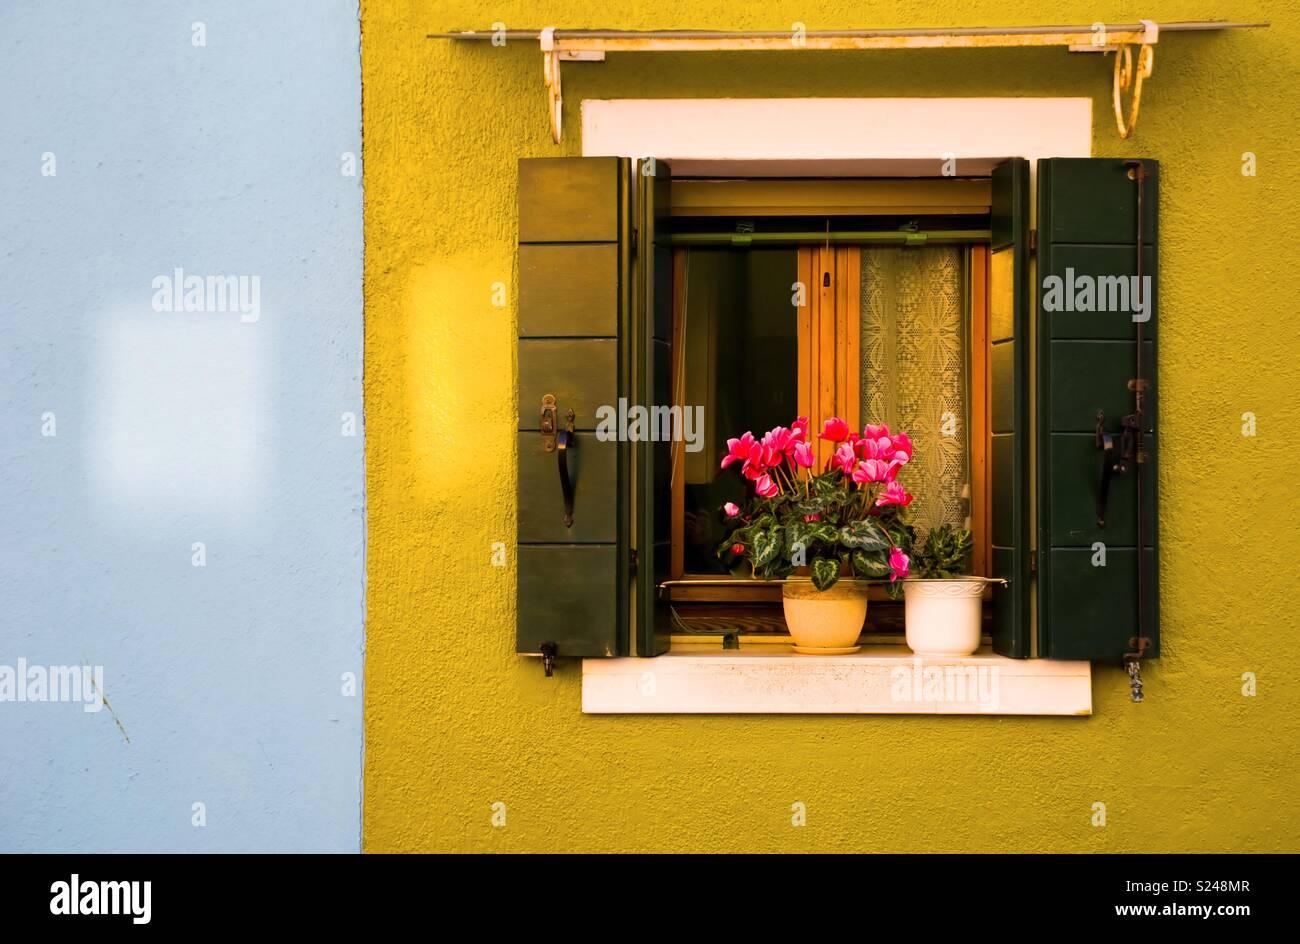 Burano window - Stock Image